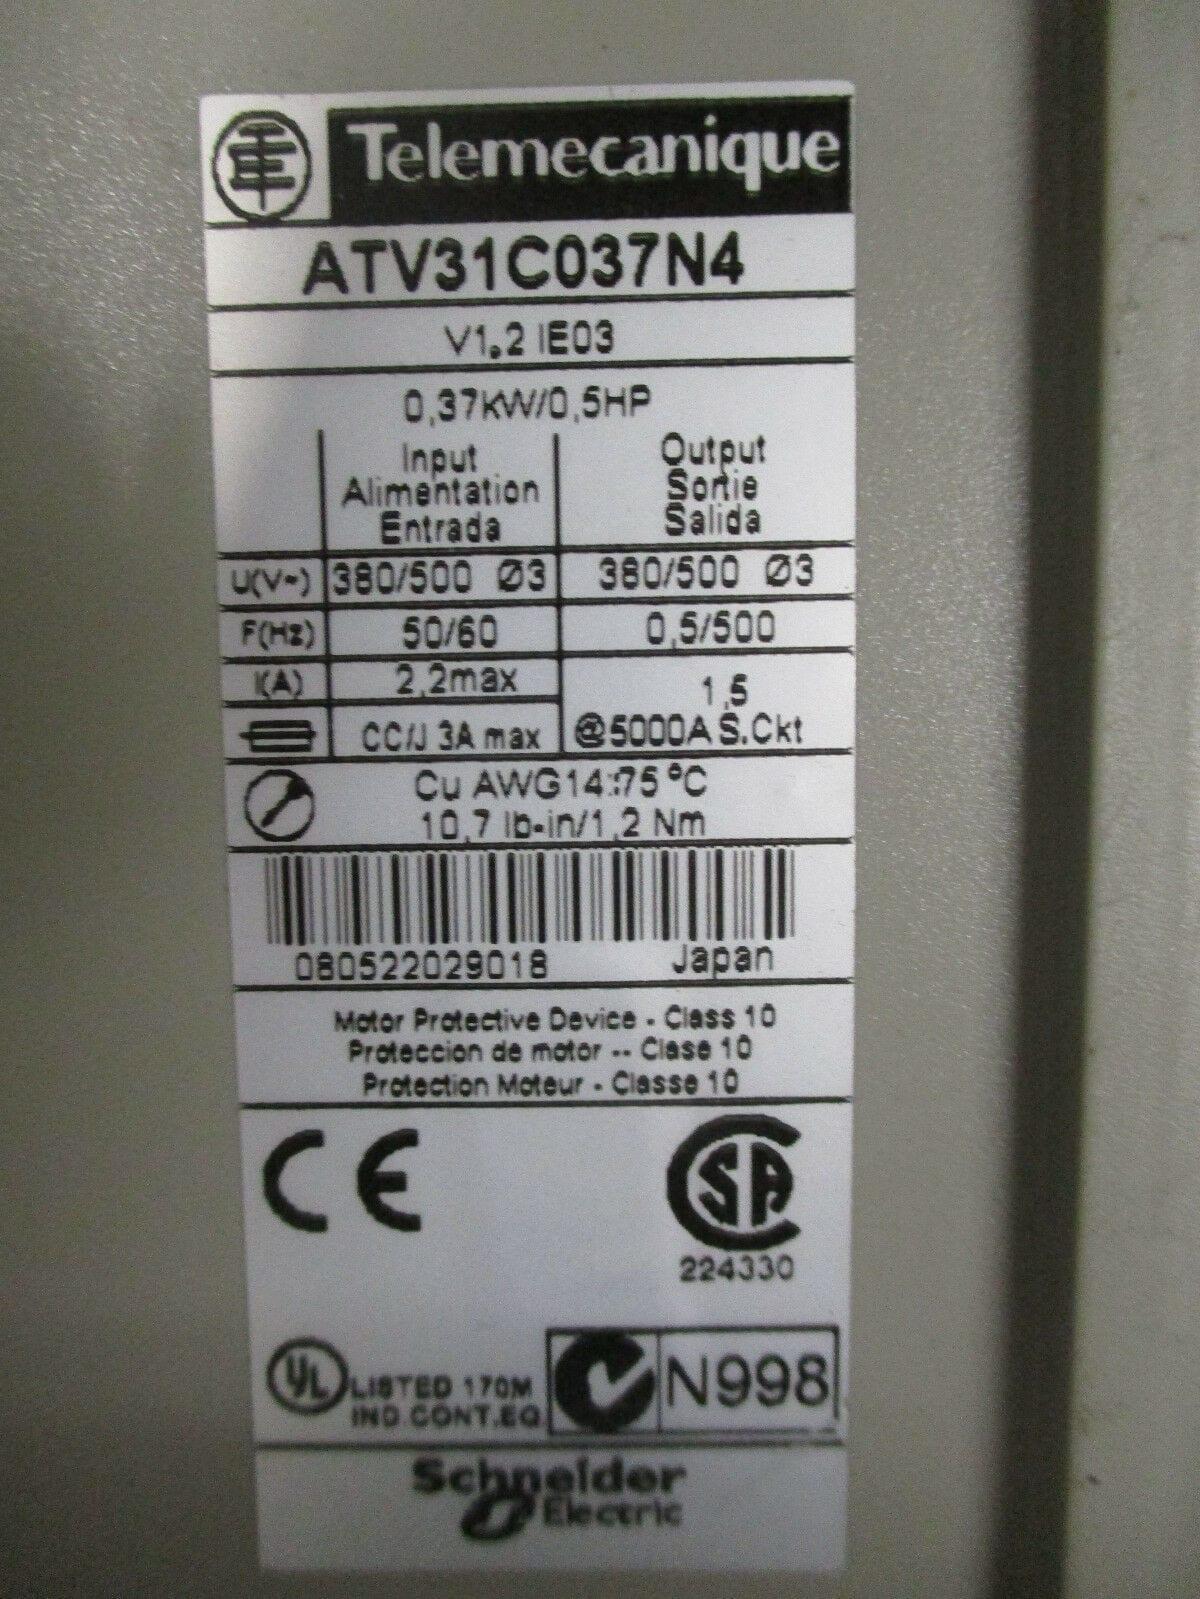 Telemecanique ATV31C037N4 Altivar 31 AC Drive 380/500VAC 0 5HP/0 37kW  *Tested